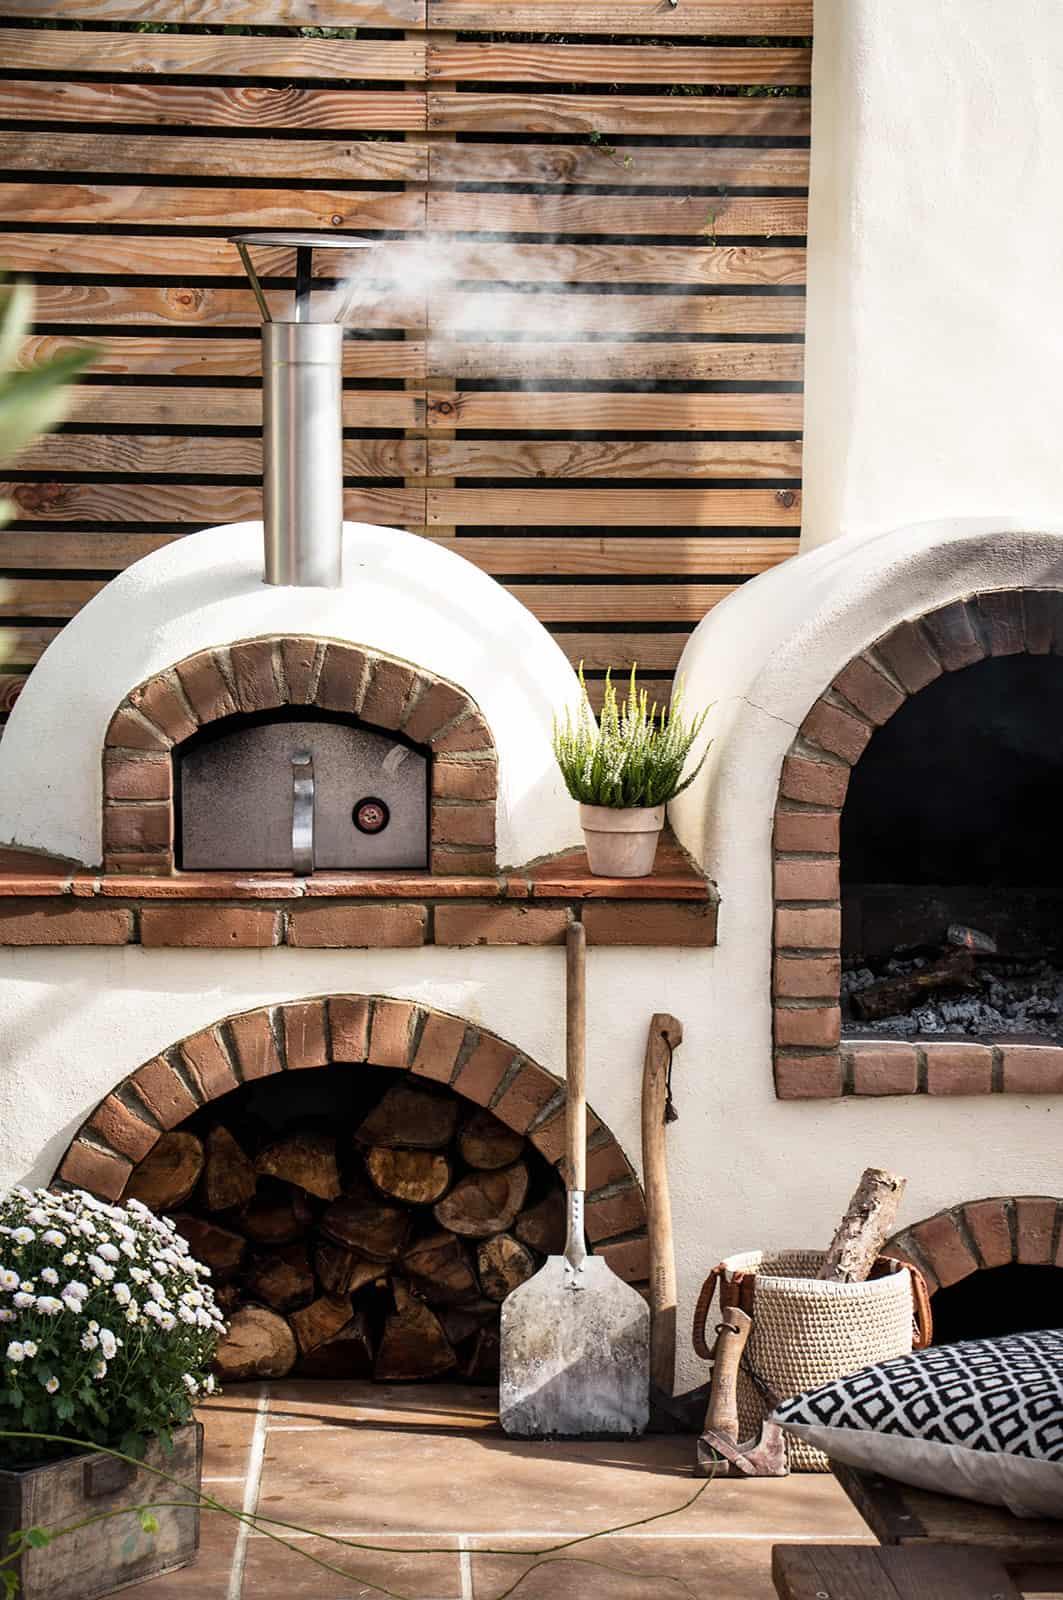 mediterranean-garden-with-a-pizza-oven